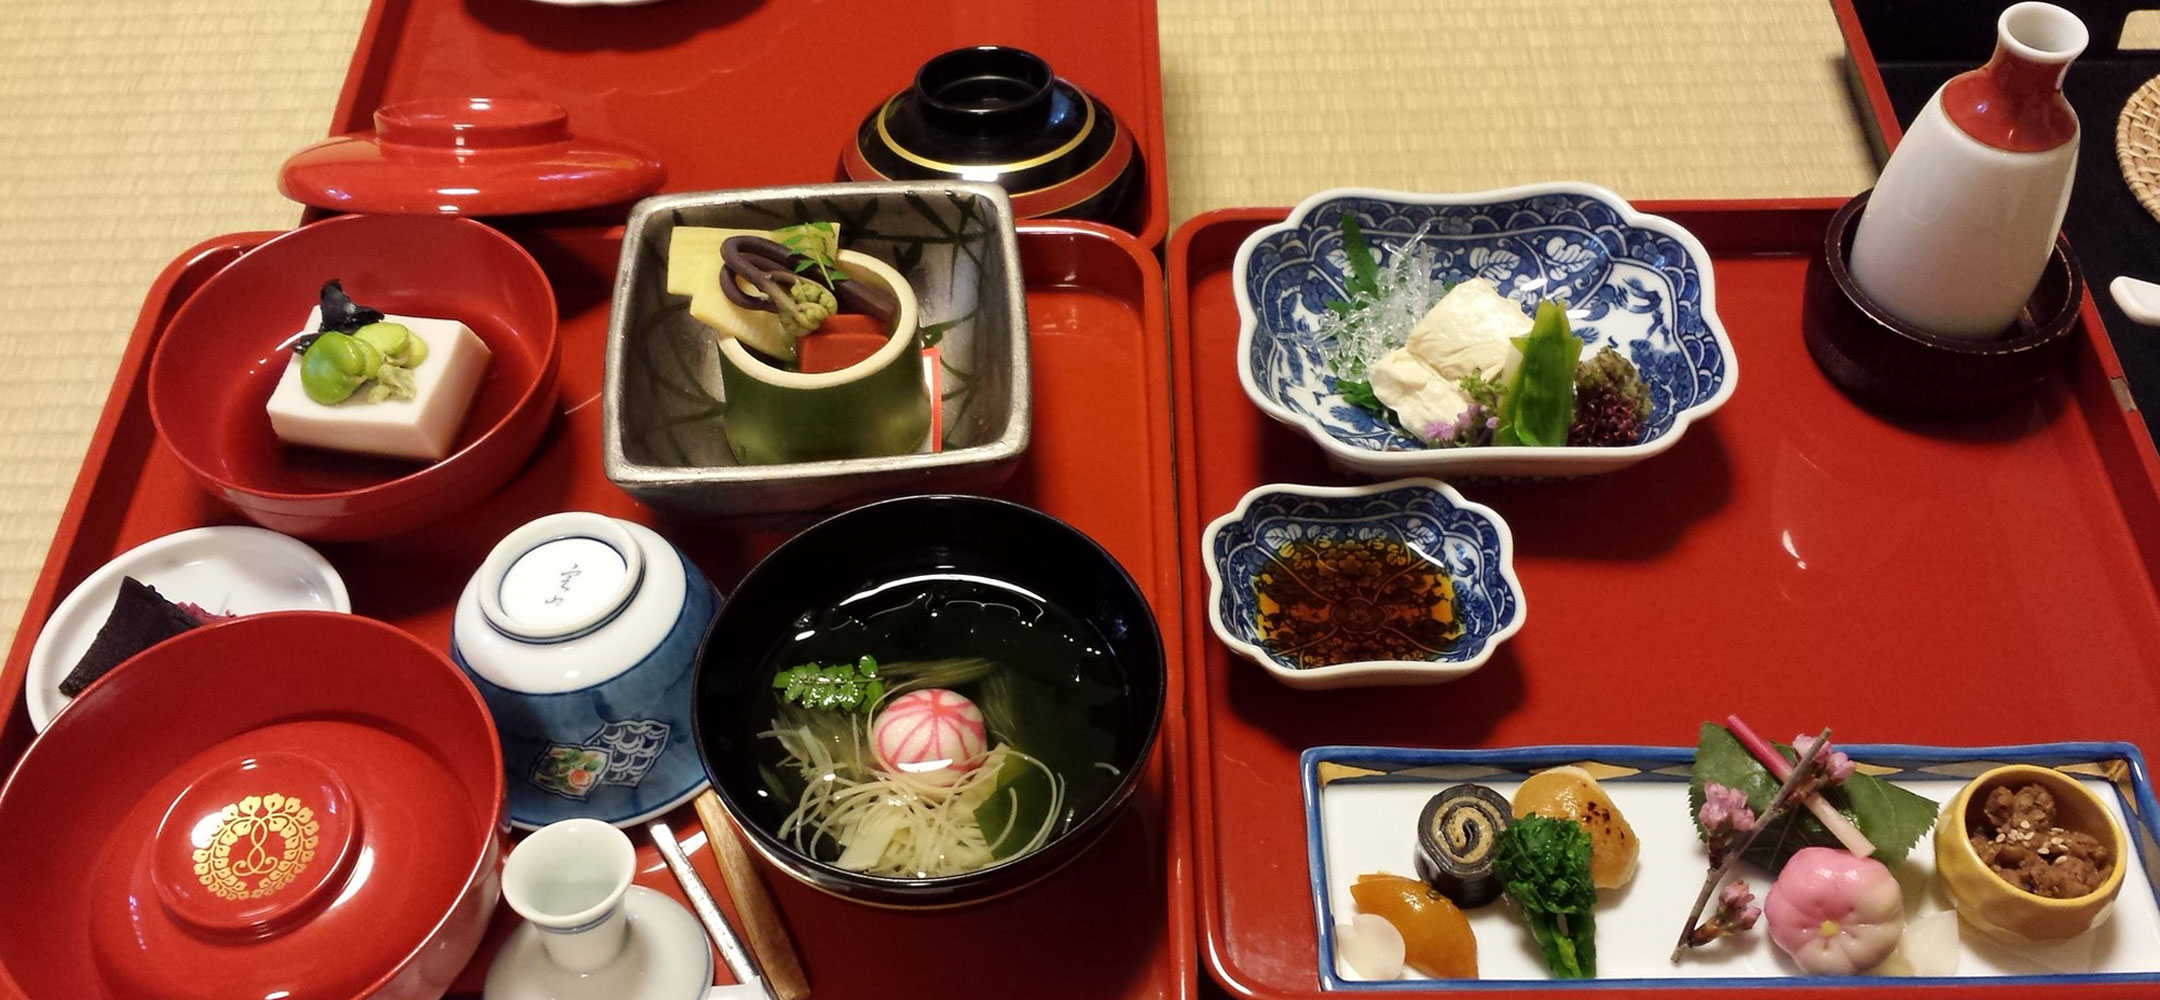 Shojin ryori, vegan Buddhist cuisine